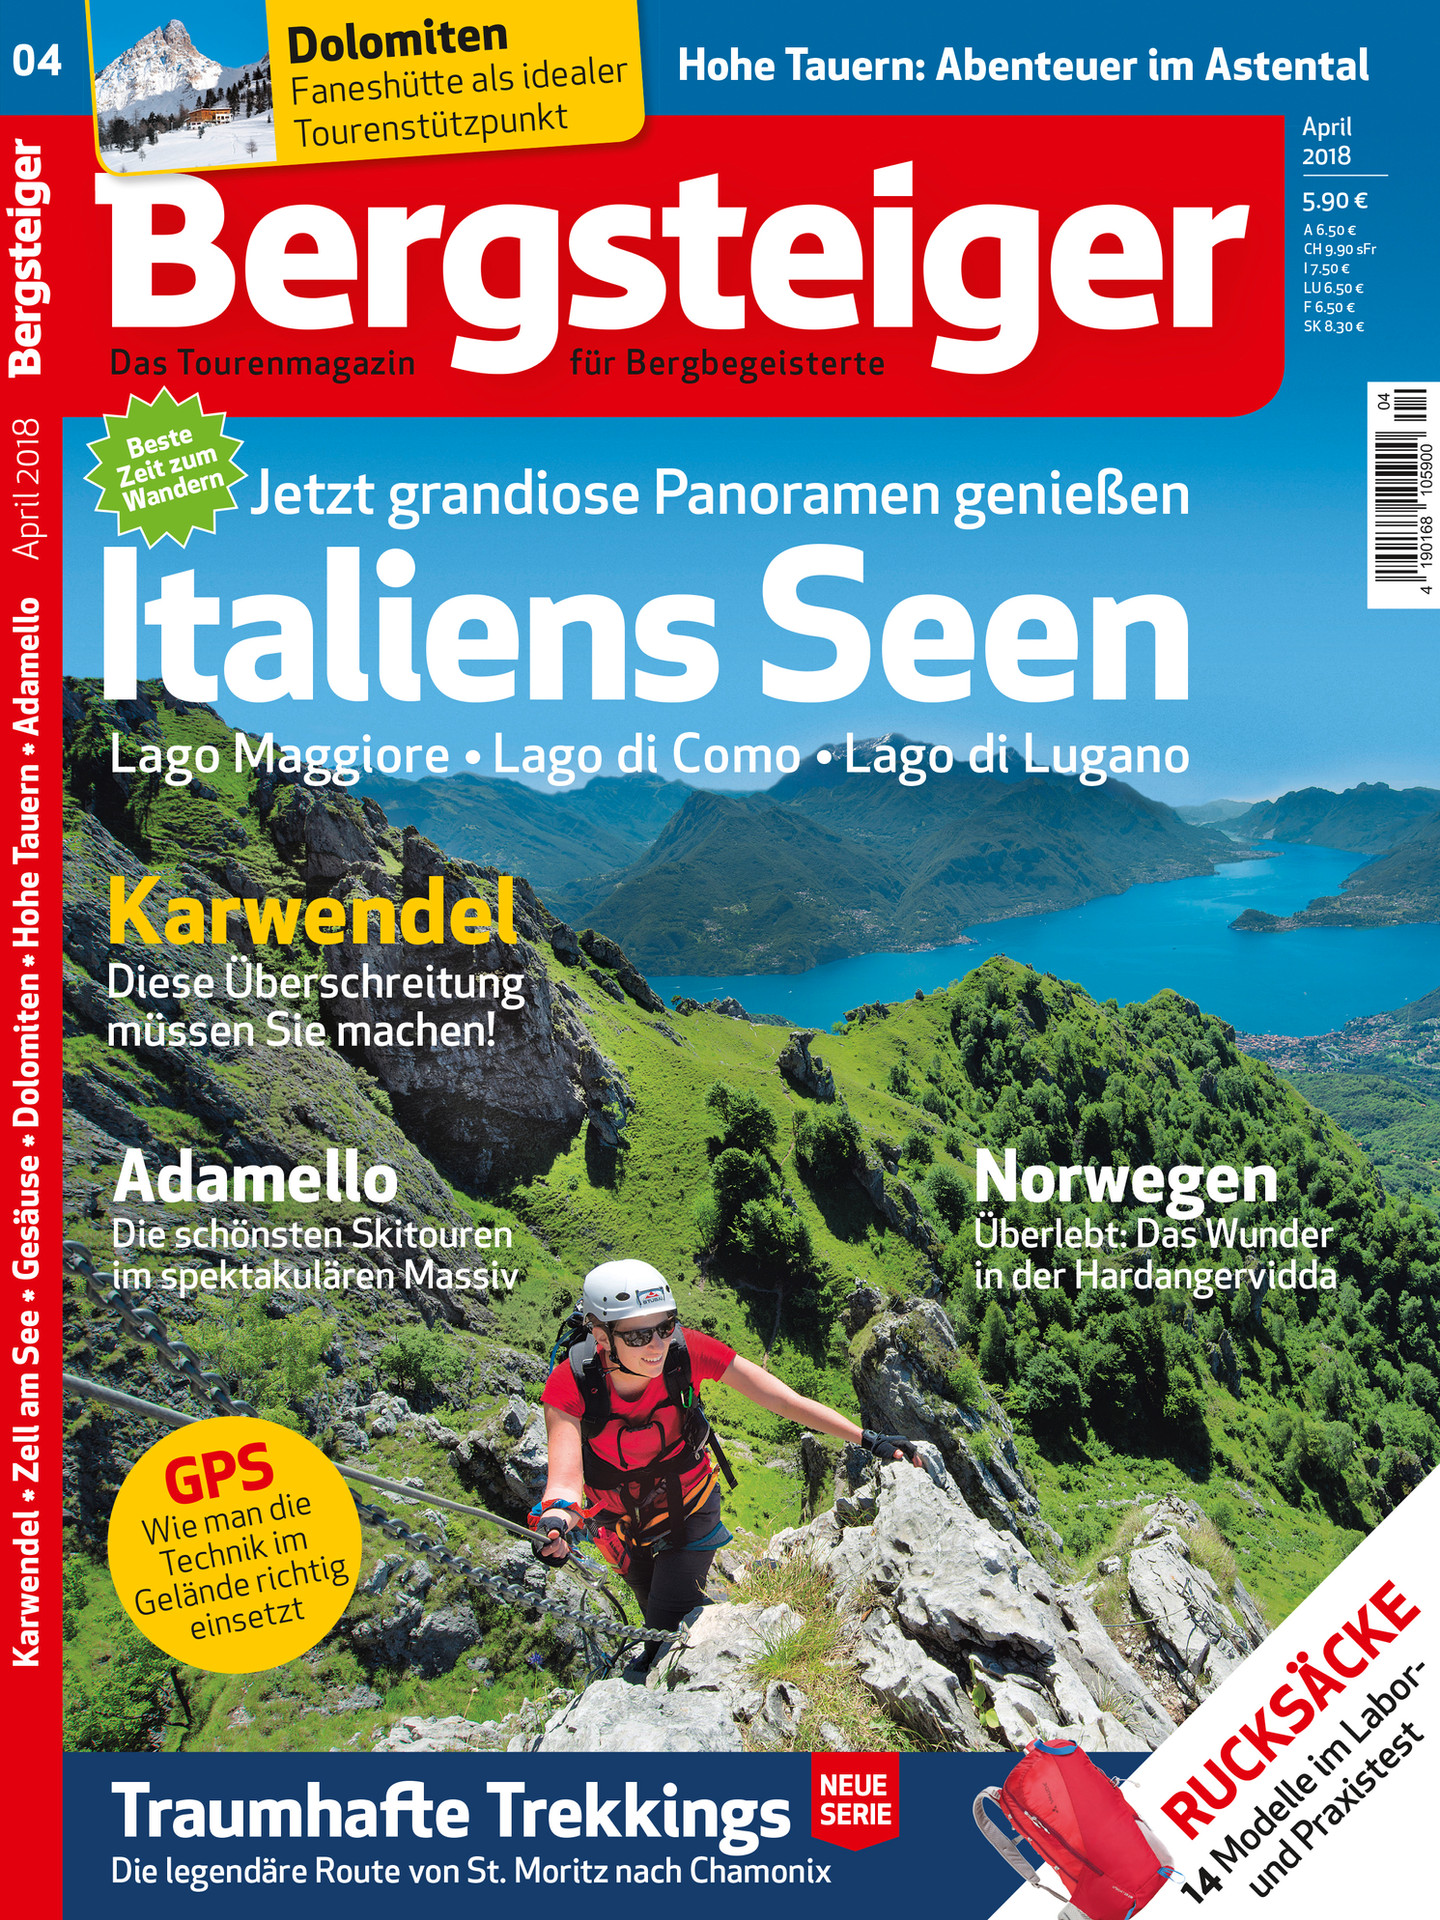 Bergsteiger 4/18: Titelbild